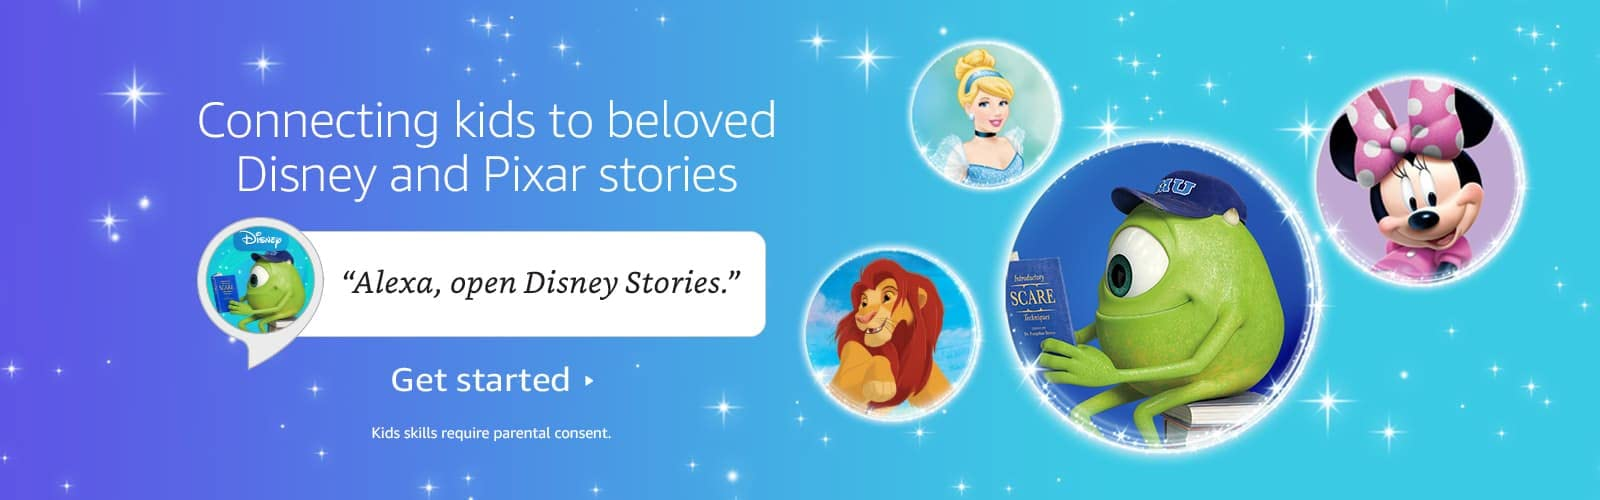 alexa open Disney and Pixar stories